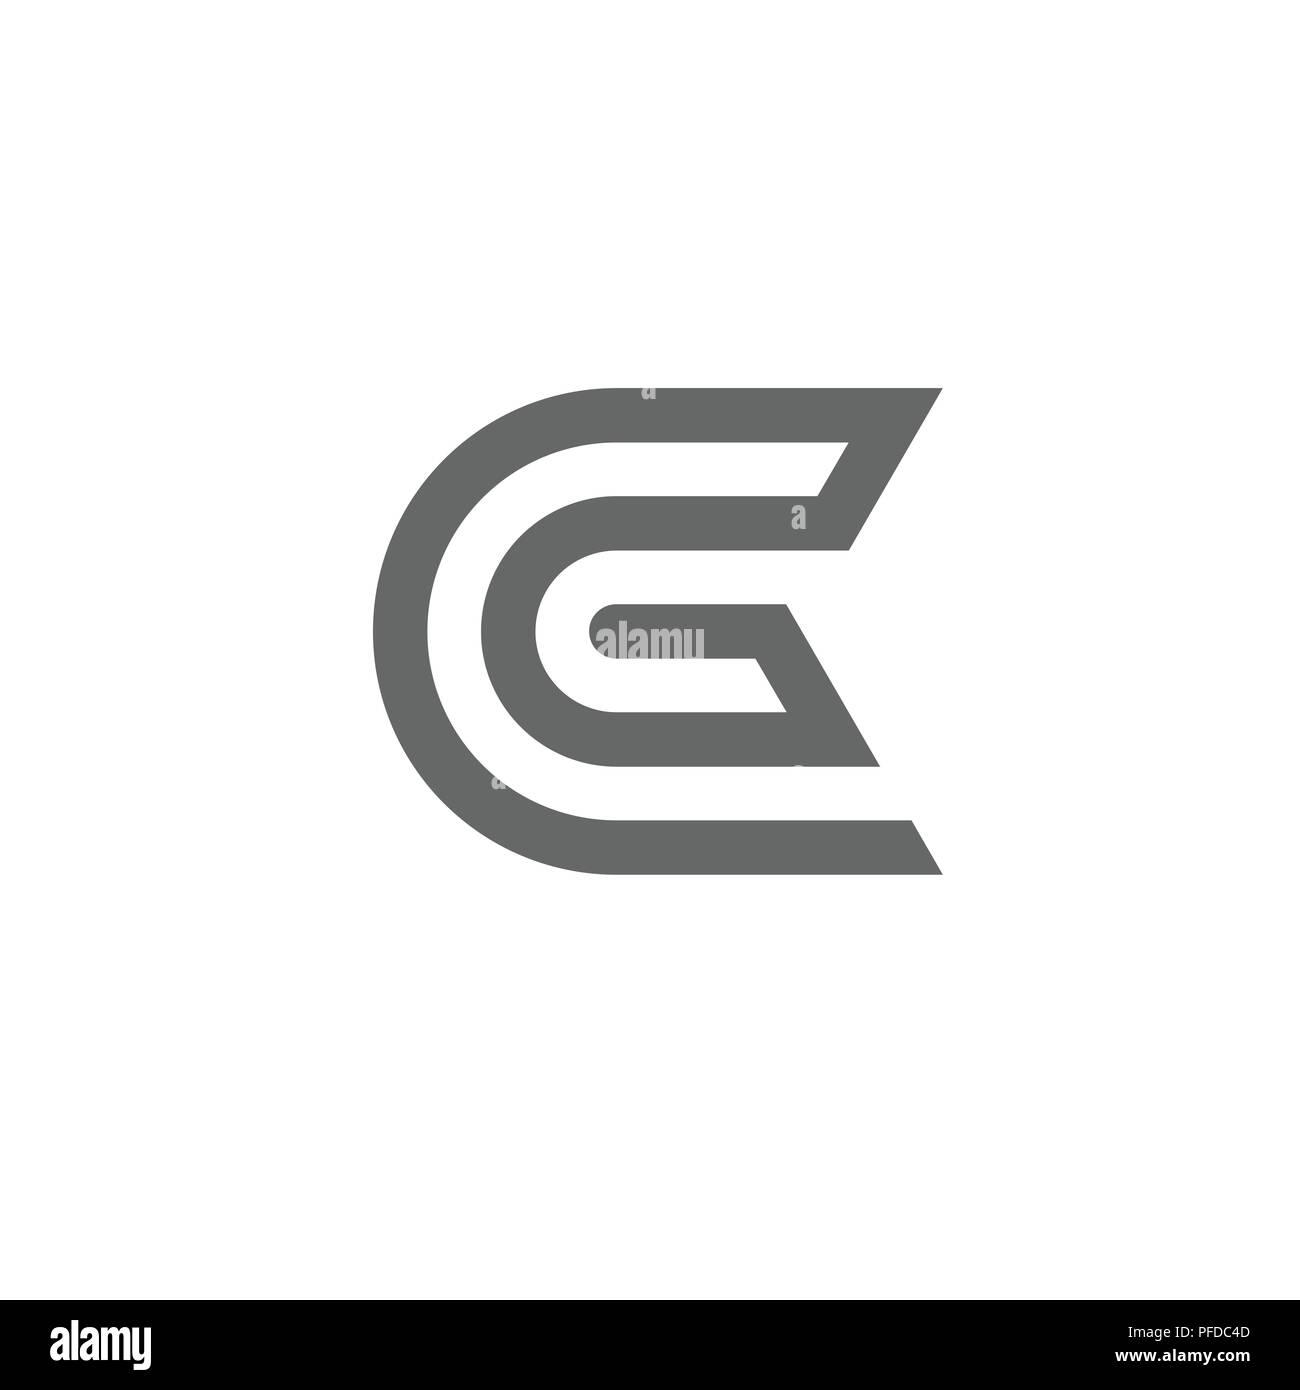 g letter logo with circle design vector illustration template letter g logo vector creative letter g letter logo